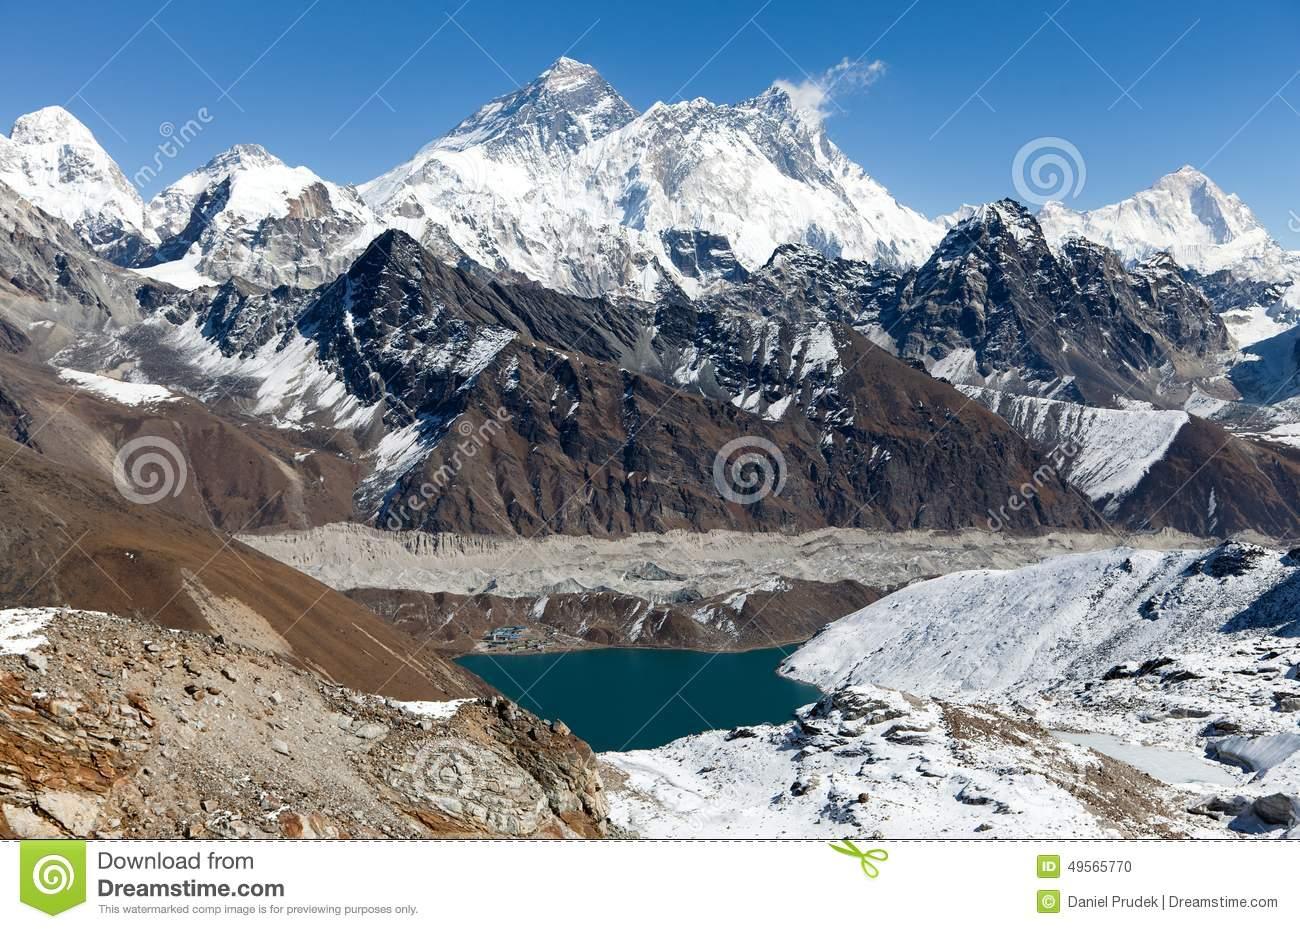 Lhotse clipart #2, Download drawings